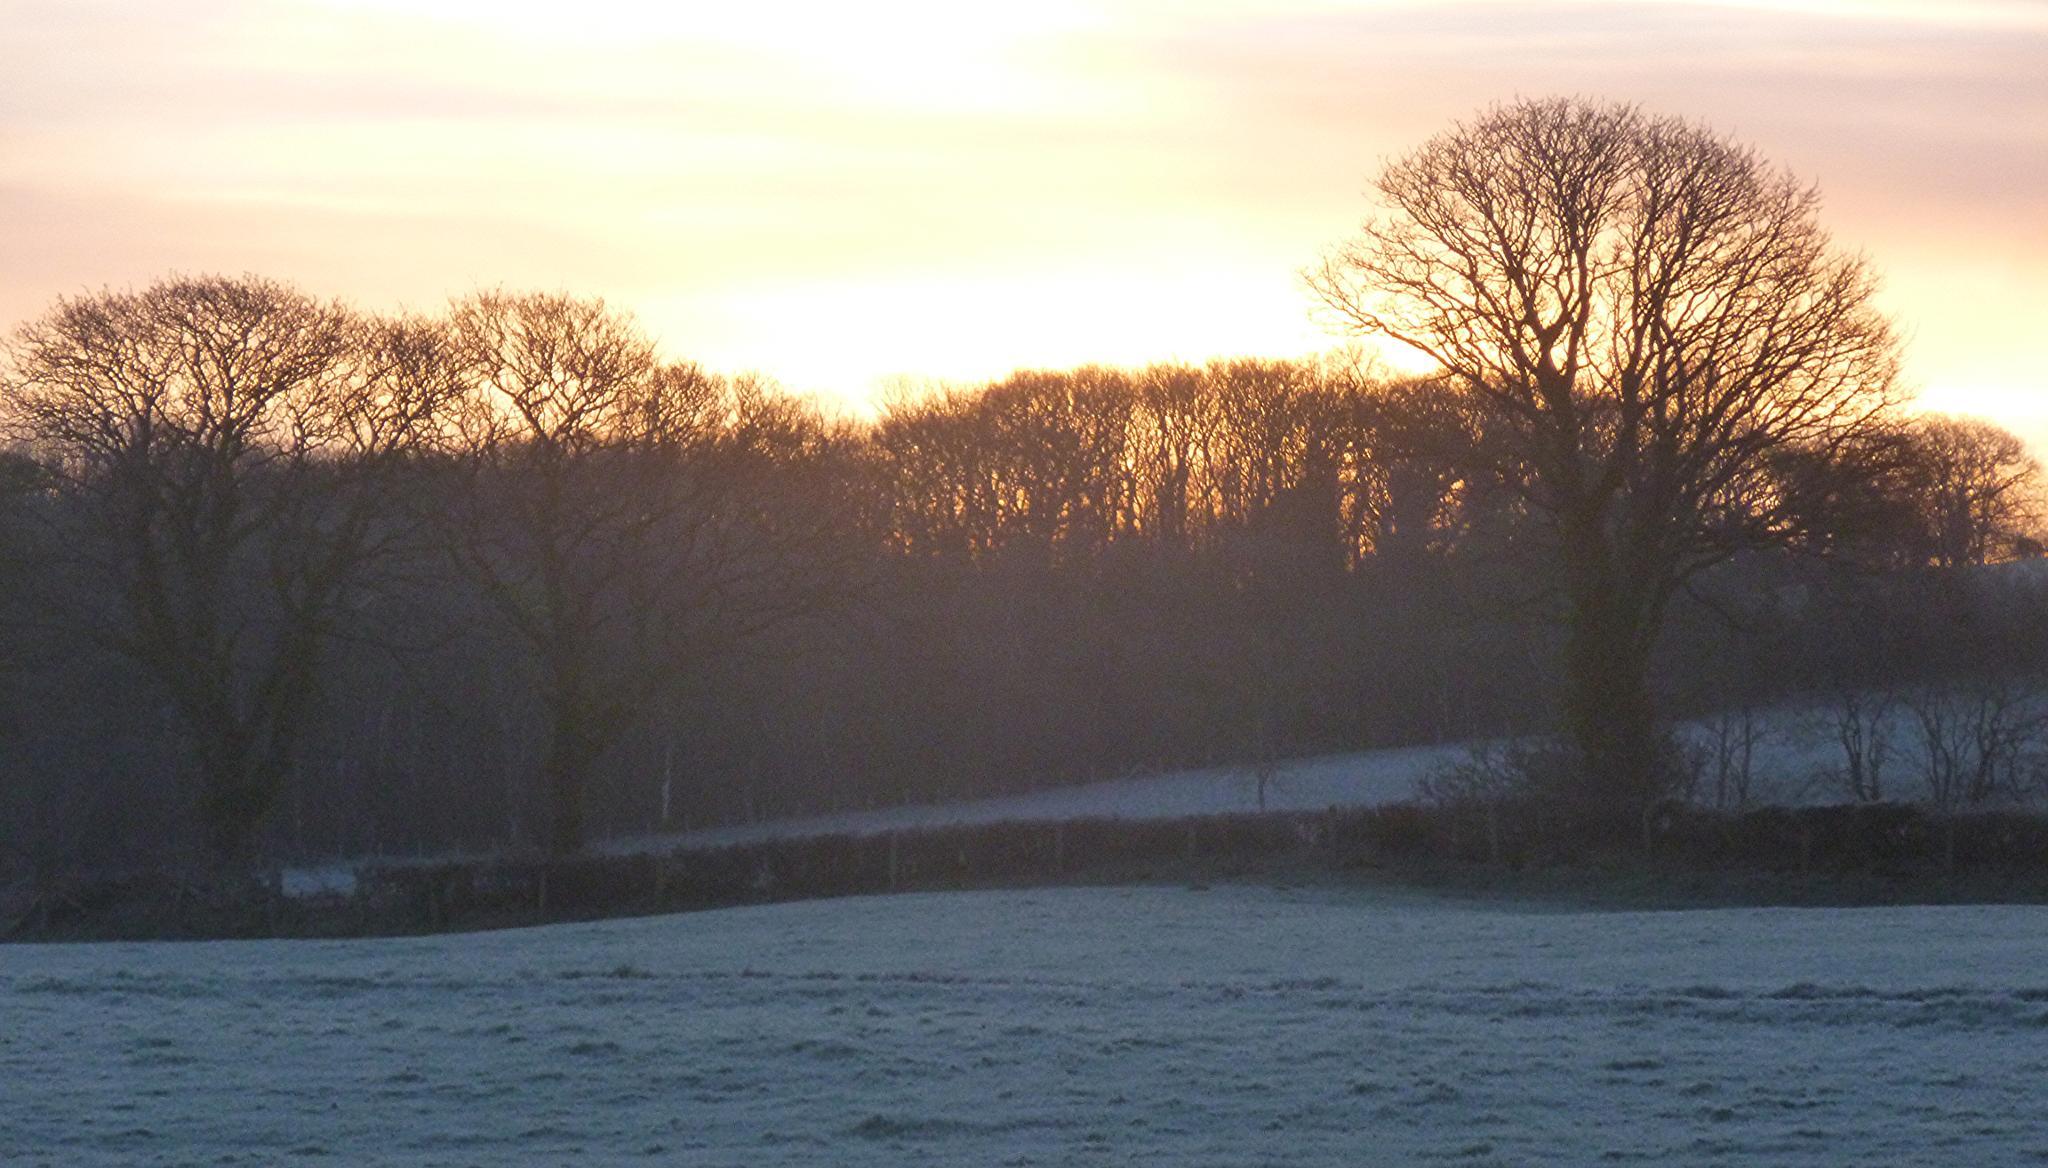 sunrise by chris.adams.3557